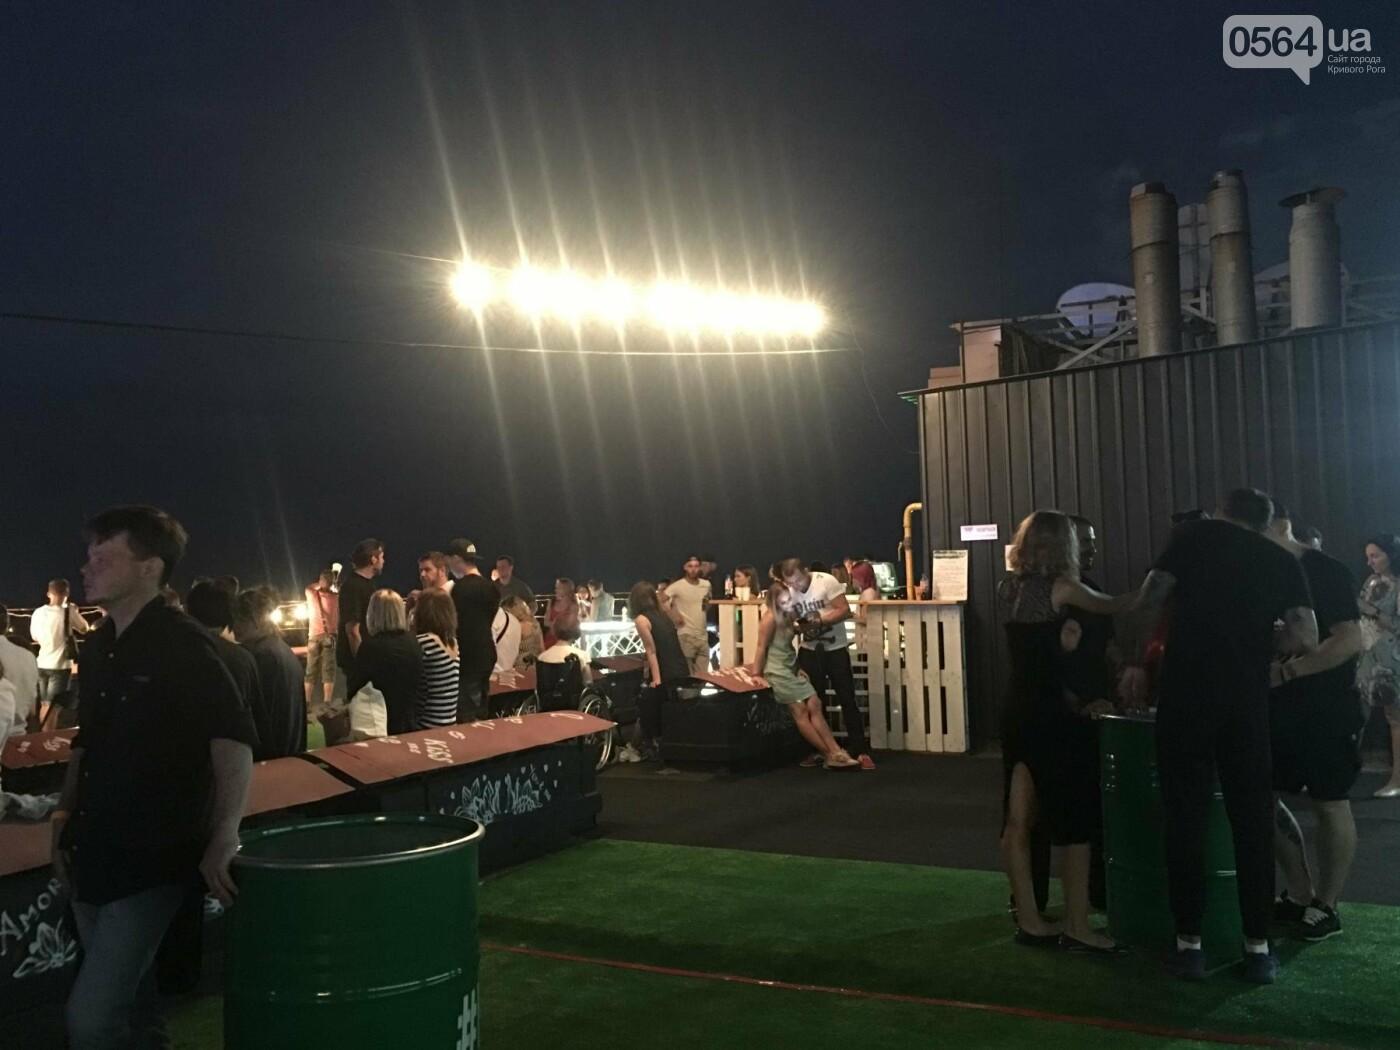 Сотни криворожан встречали закат на крыше отеля под мелодии джаза, - ФОТО, ВИДЕО, фото-36